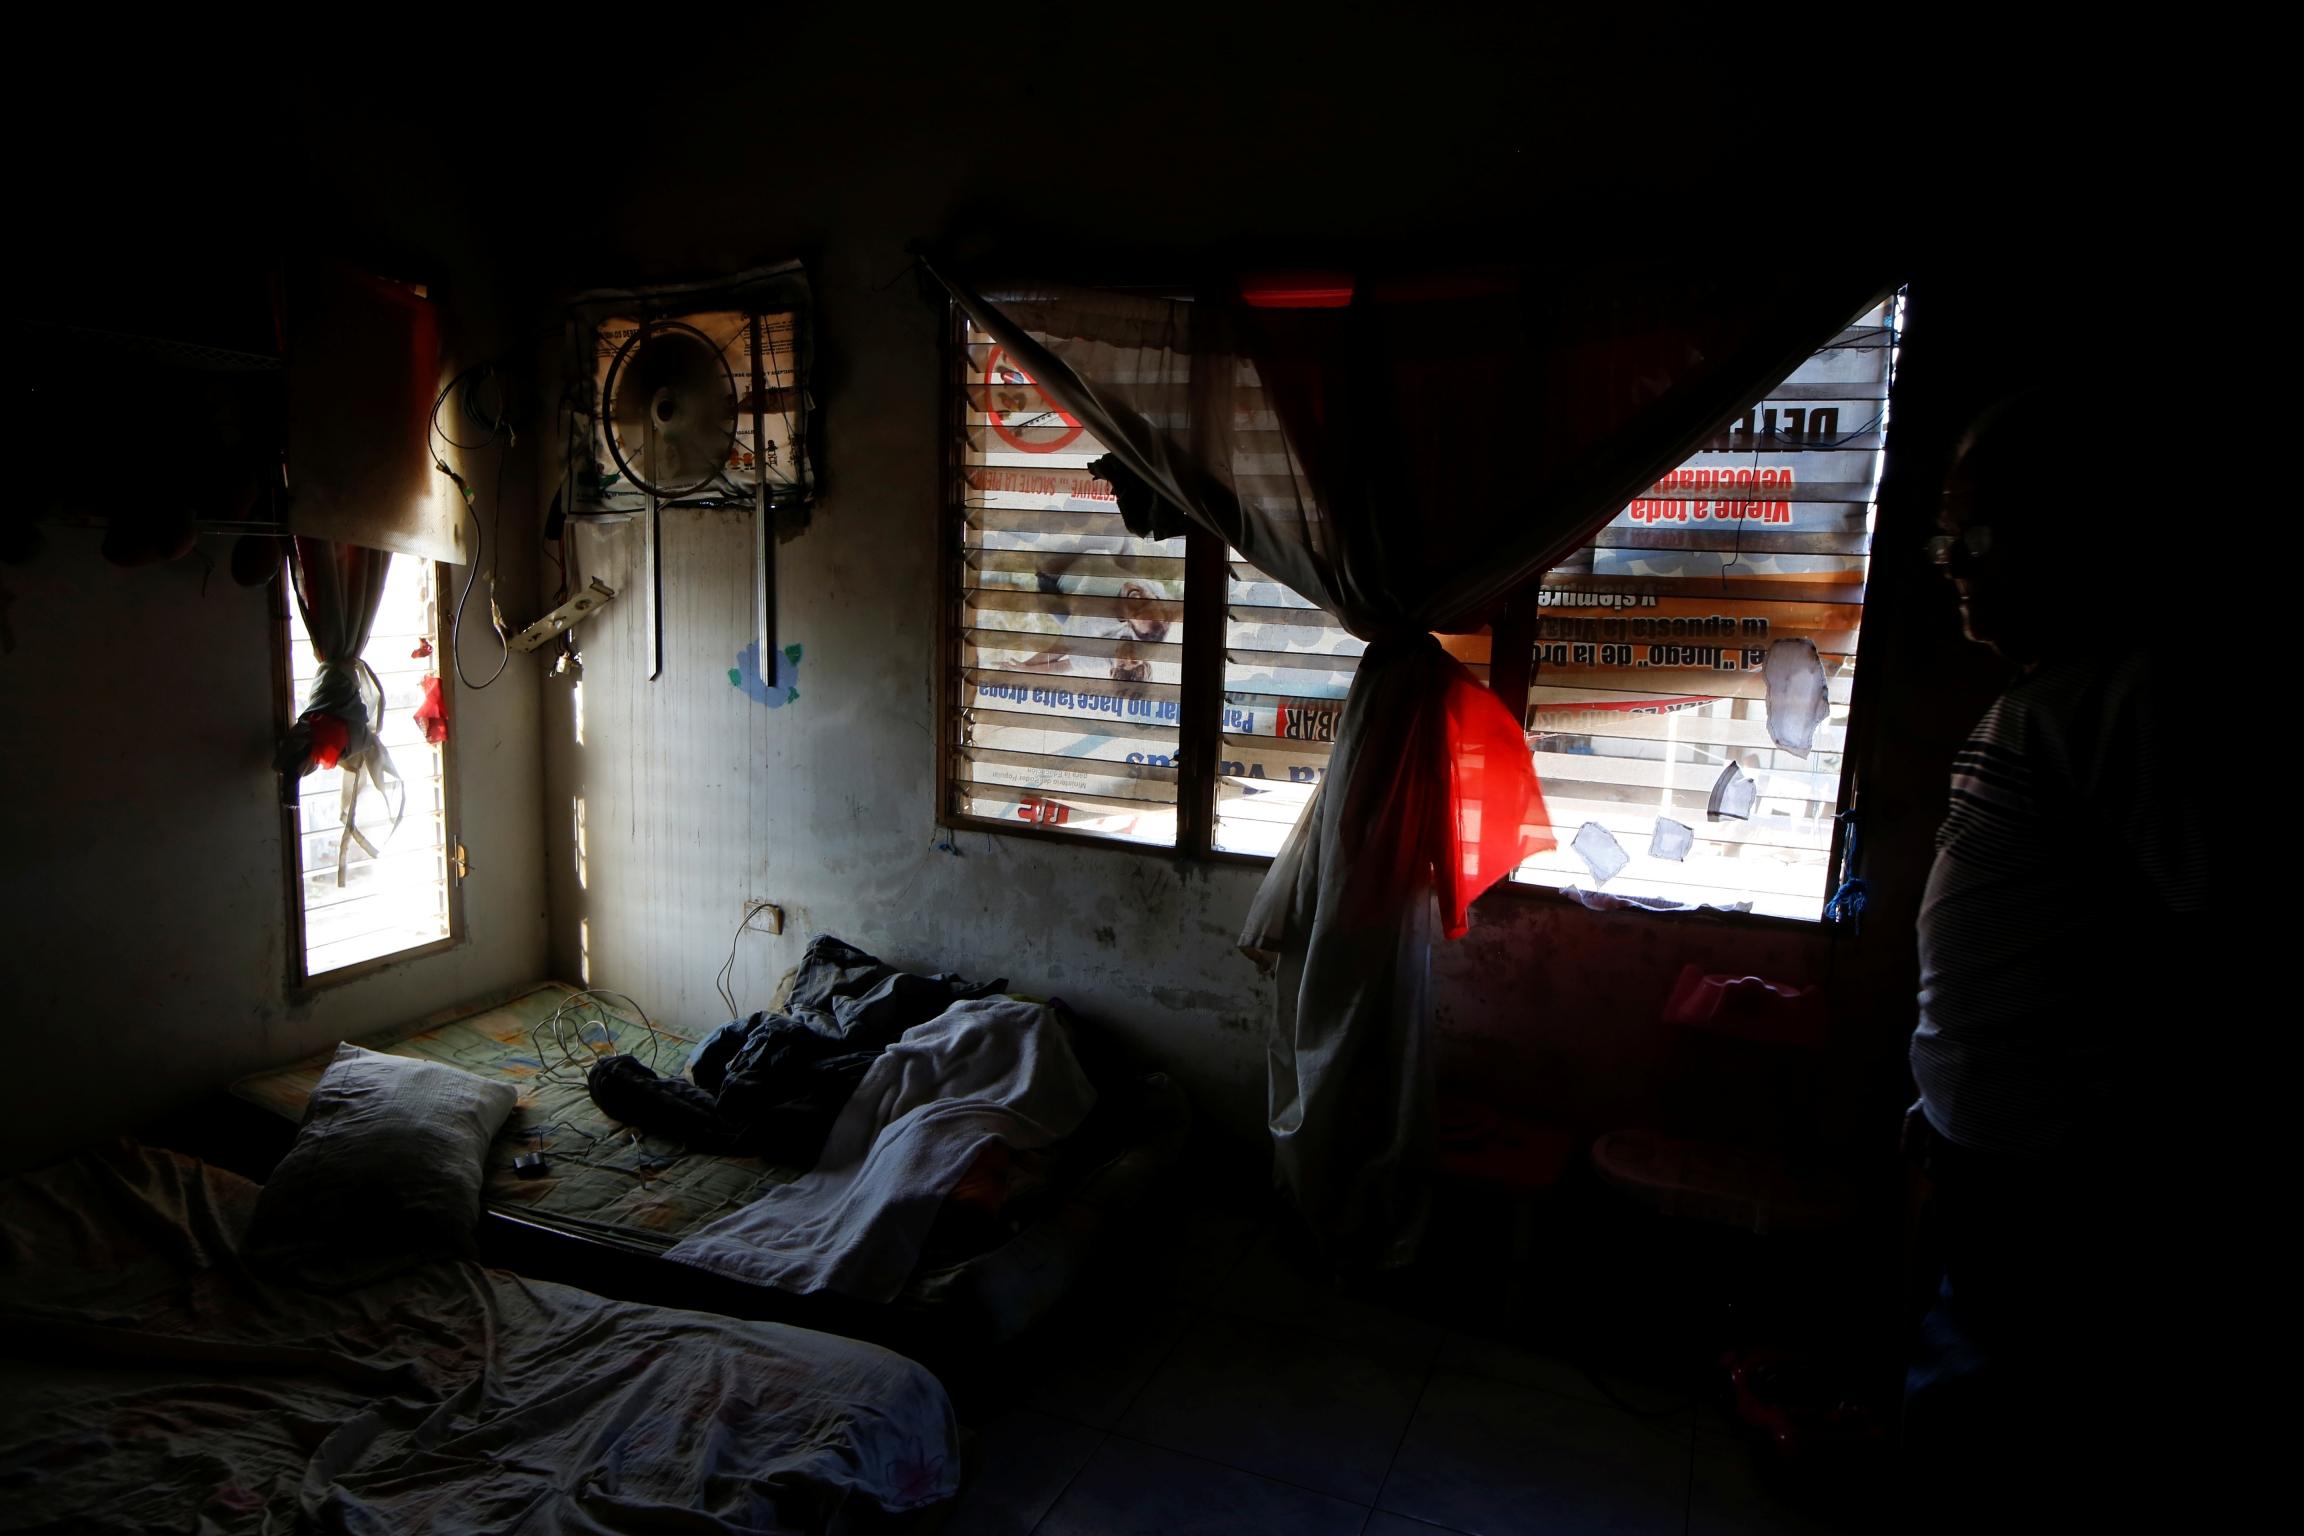 a dilapidated room in venezuela